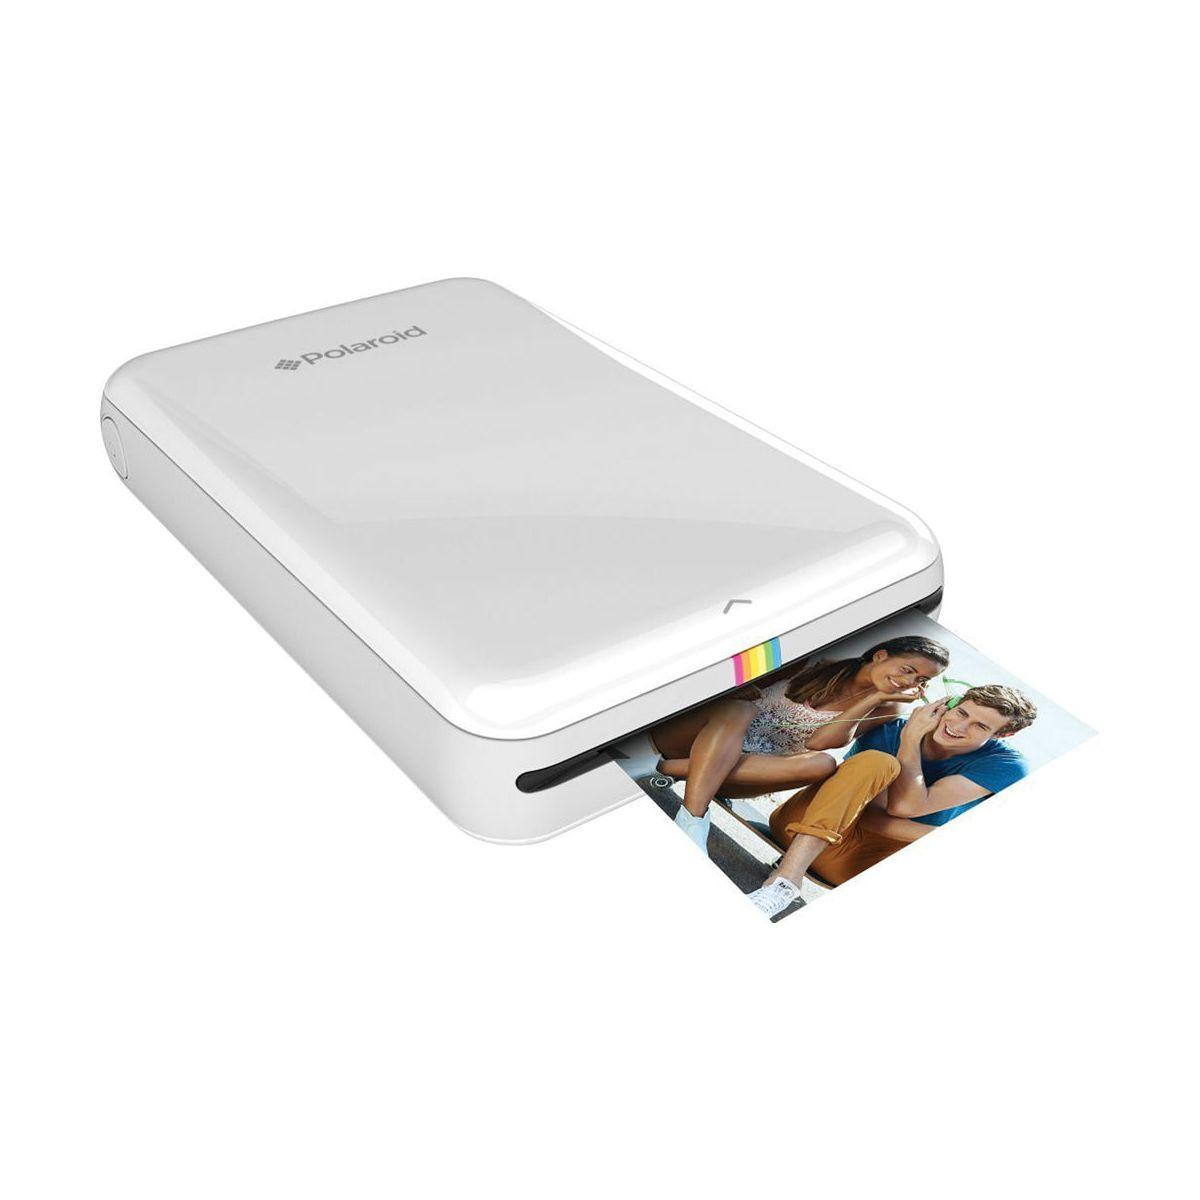 Imprimante photo portable polaroid zip blanche